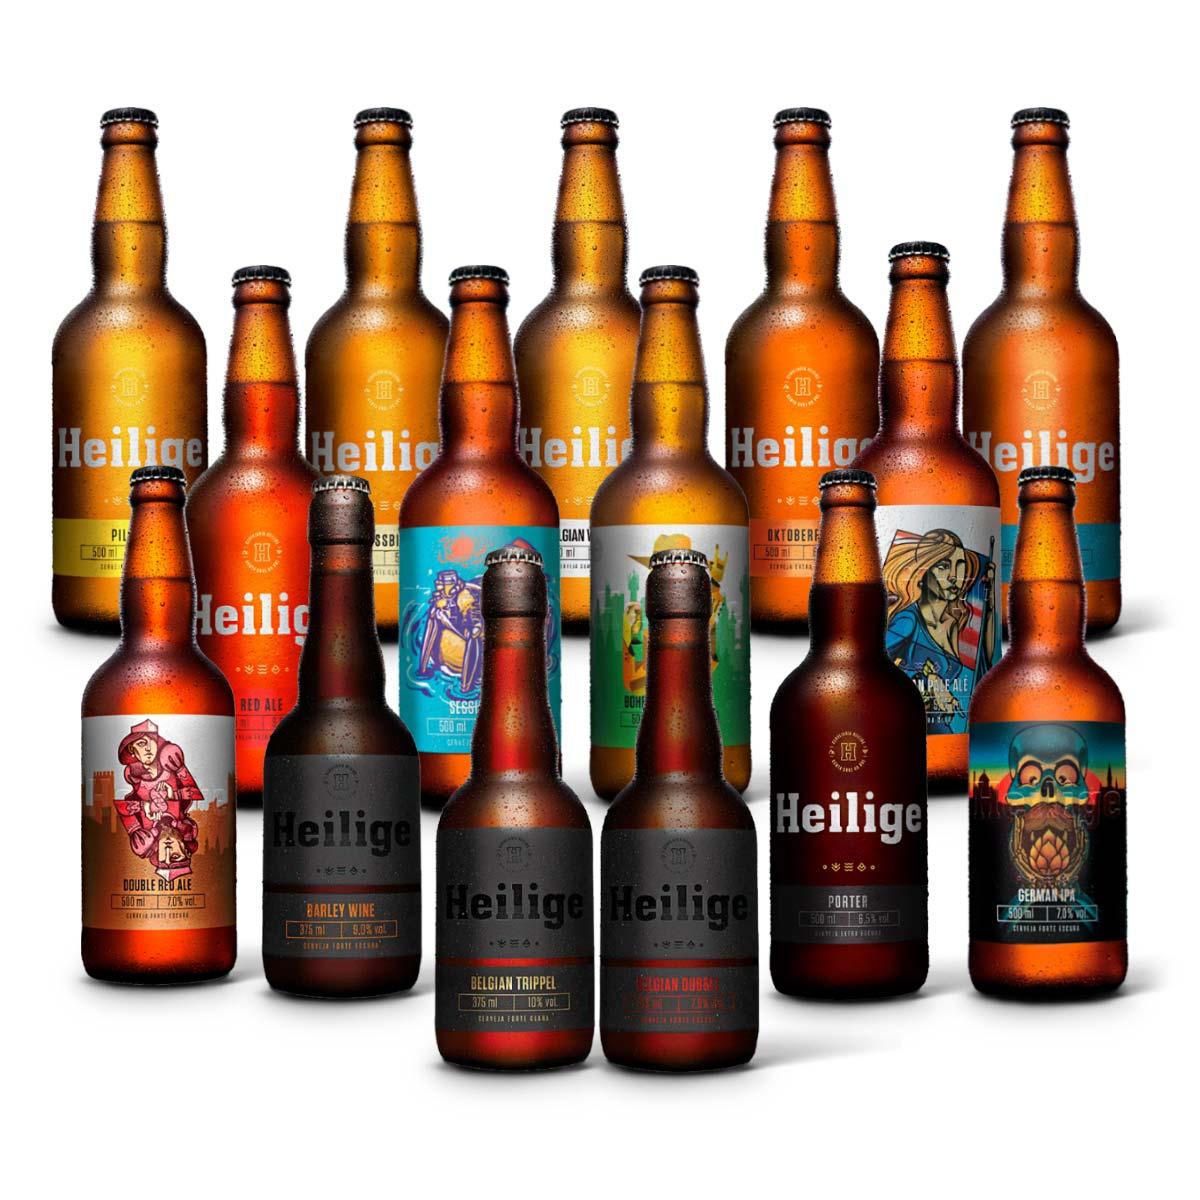 Kit degustação Heilige 15 cervejas